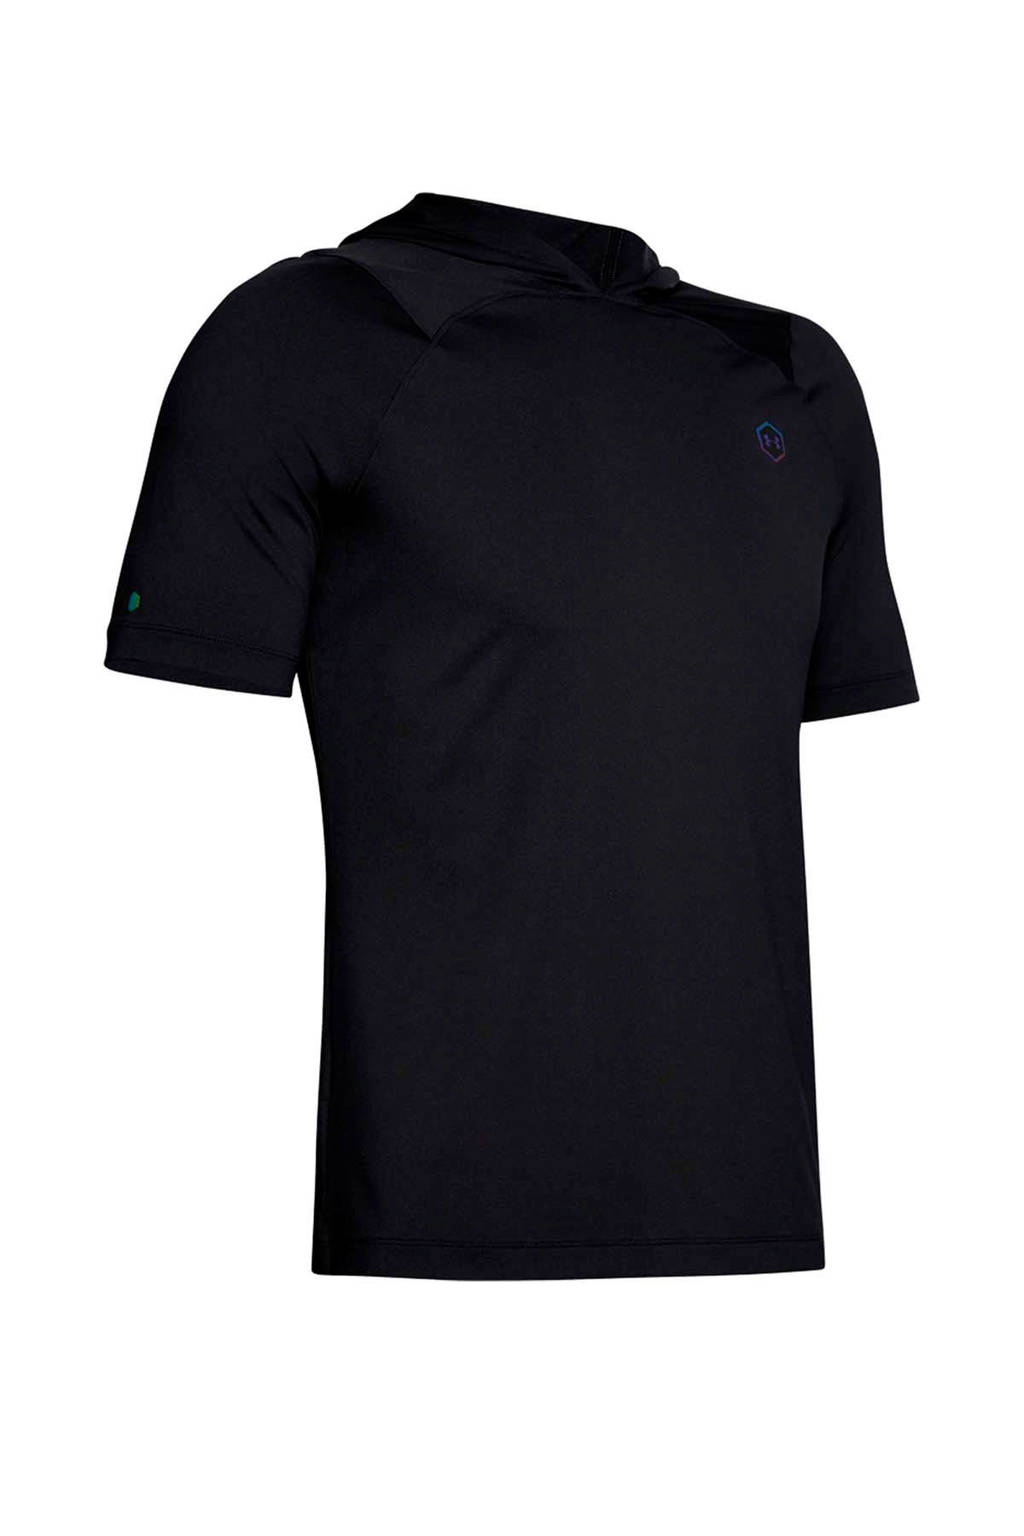 Under Armour   sportsweater met korte mouwen zwart, Zwart